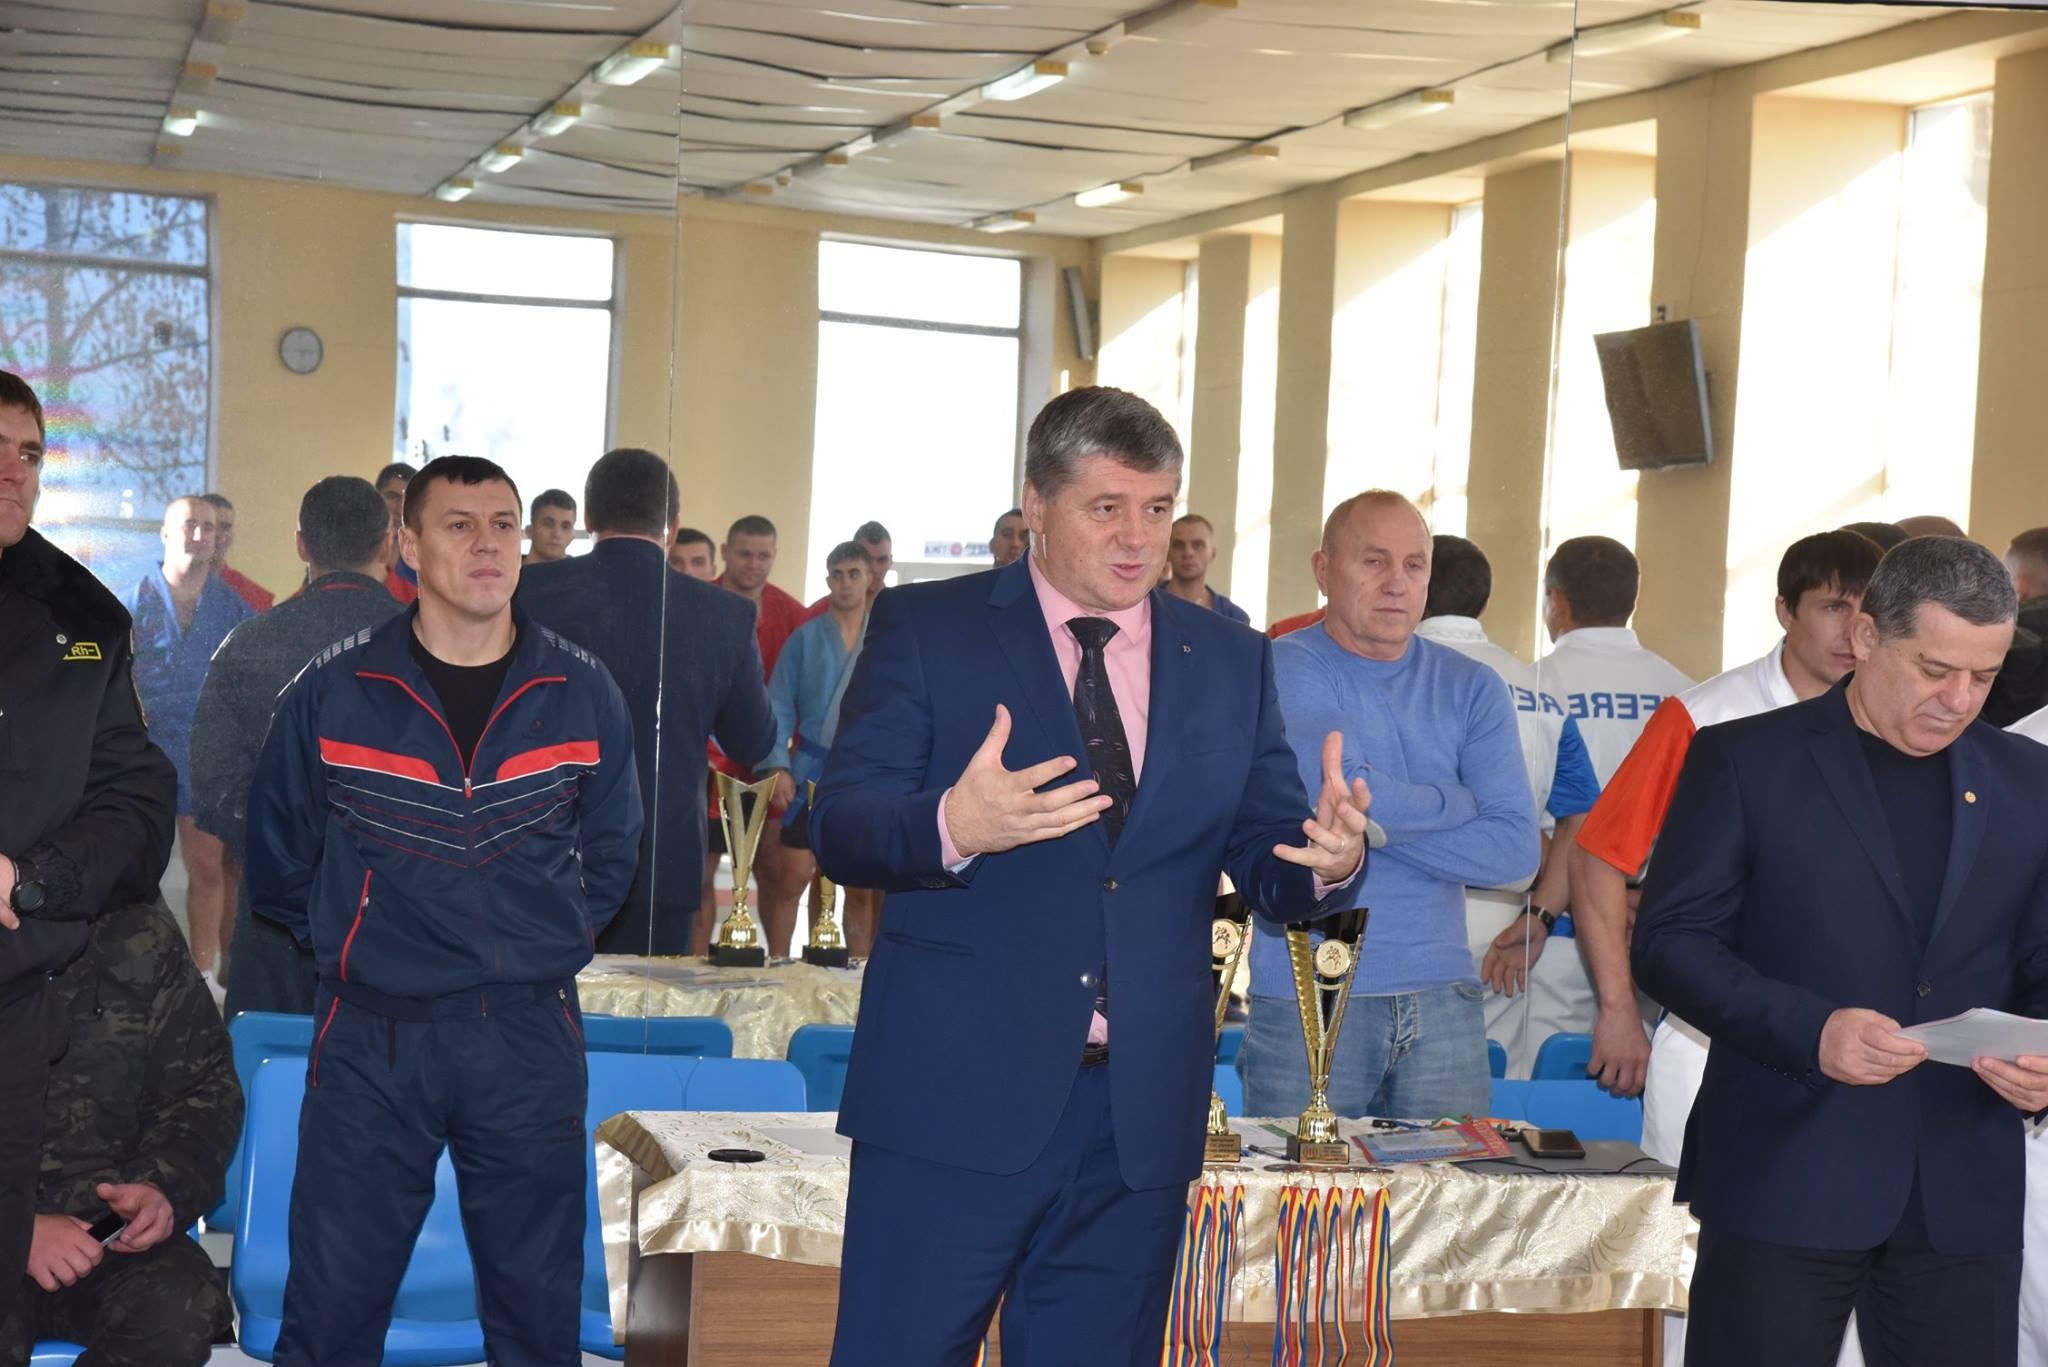 Lupta corp la corp din cadrul Spartachiadei CSC Dinamo 201863